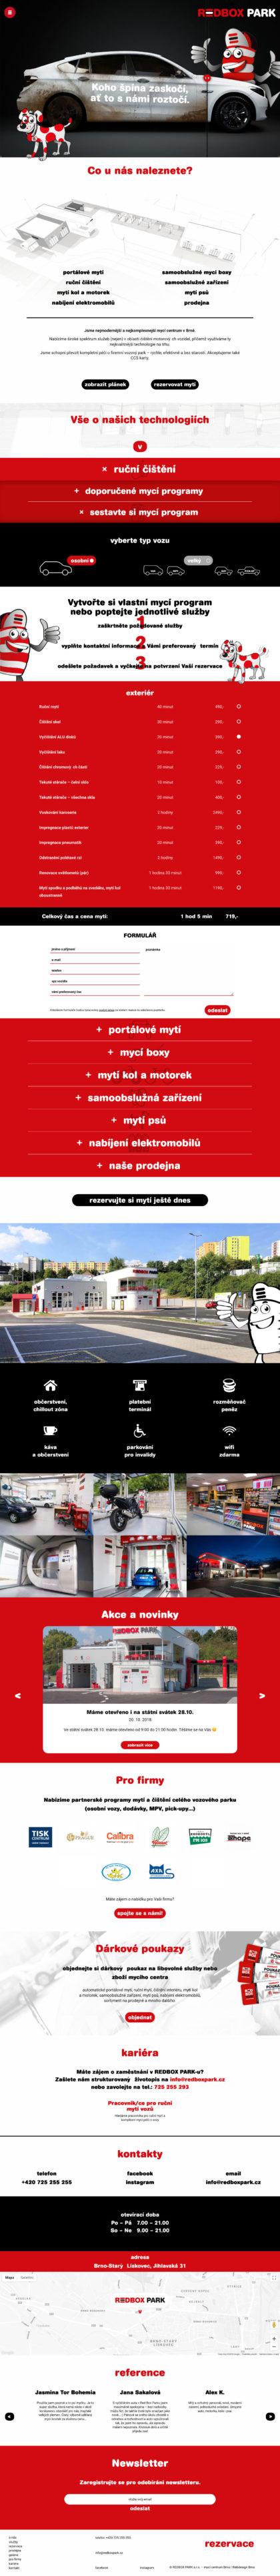 Redbox park - realizace, Web design